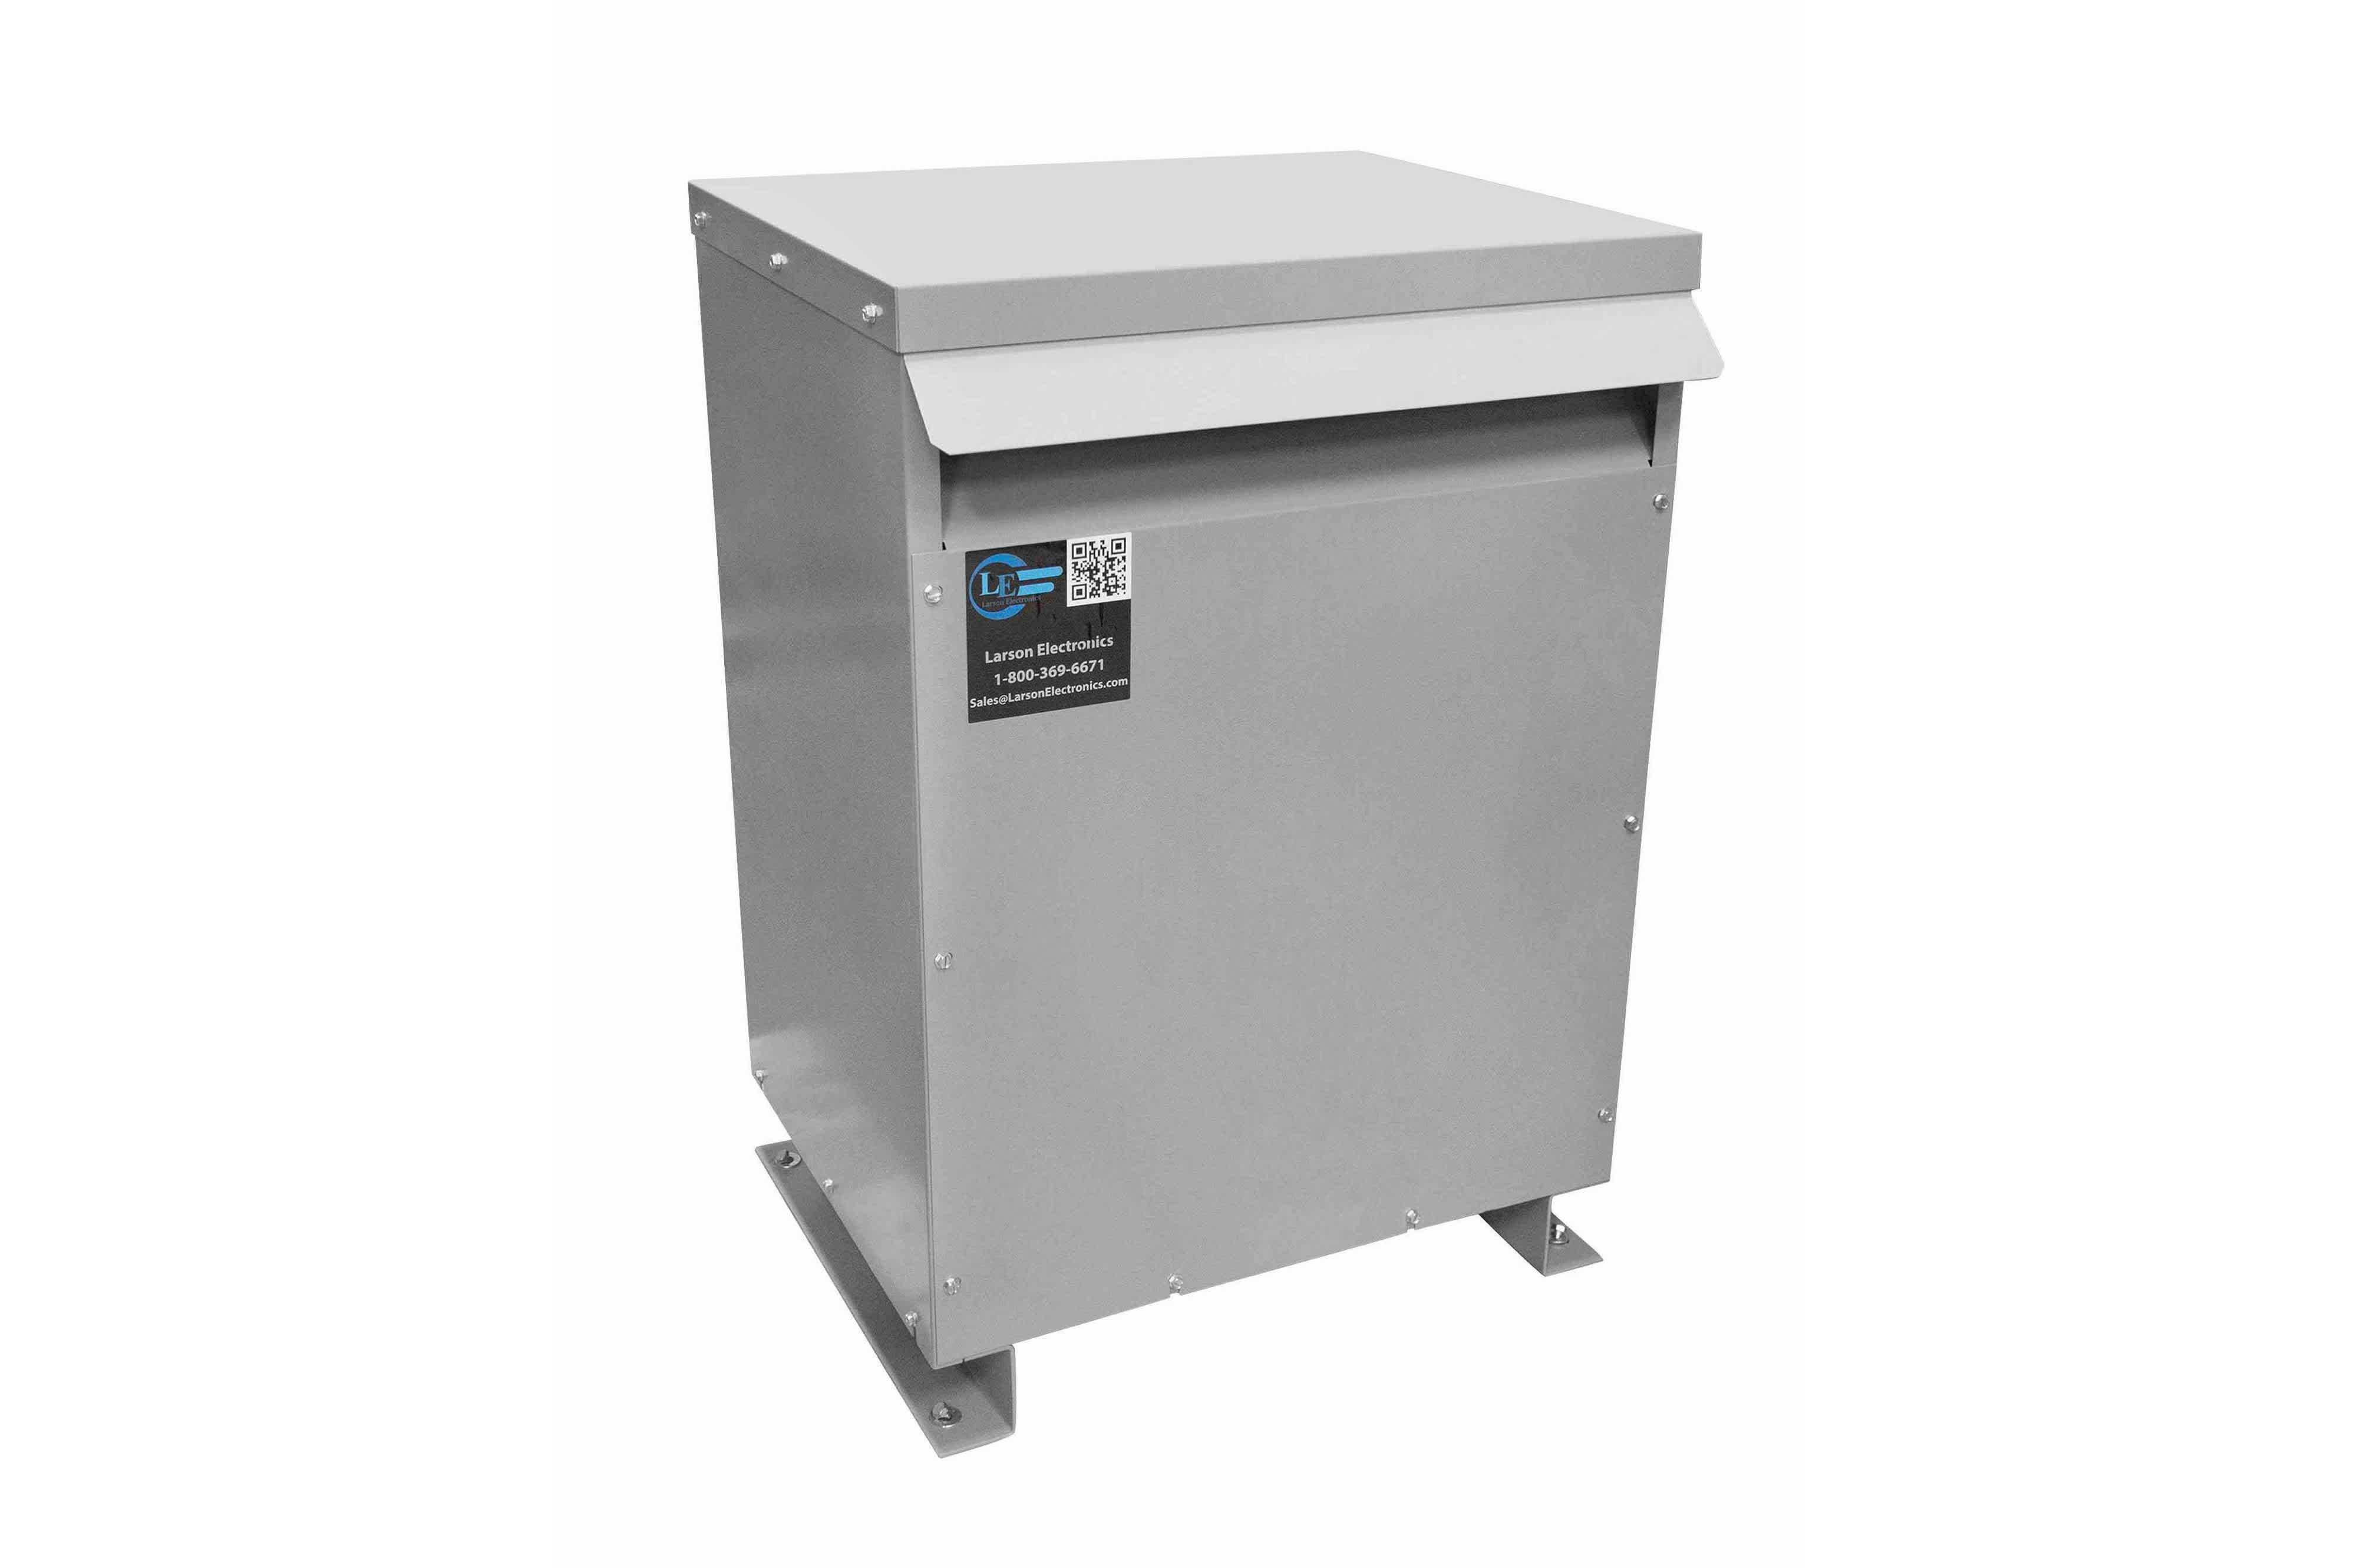 52.5 kVA 3PH Isolation Transformer, 600V Wye Primary, 415Y/240 Wye-N Secondary, N3R, Ventilated, 60 Hz